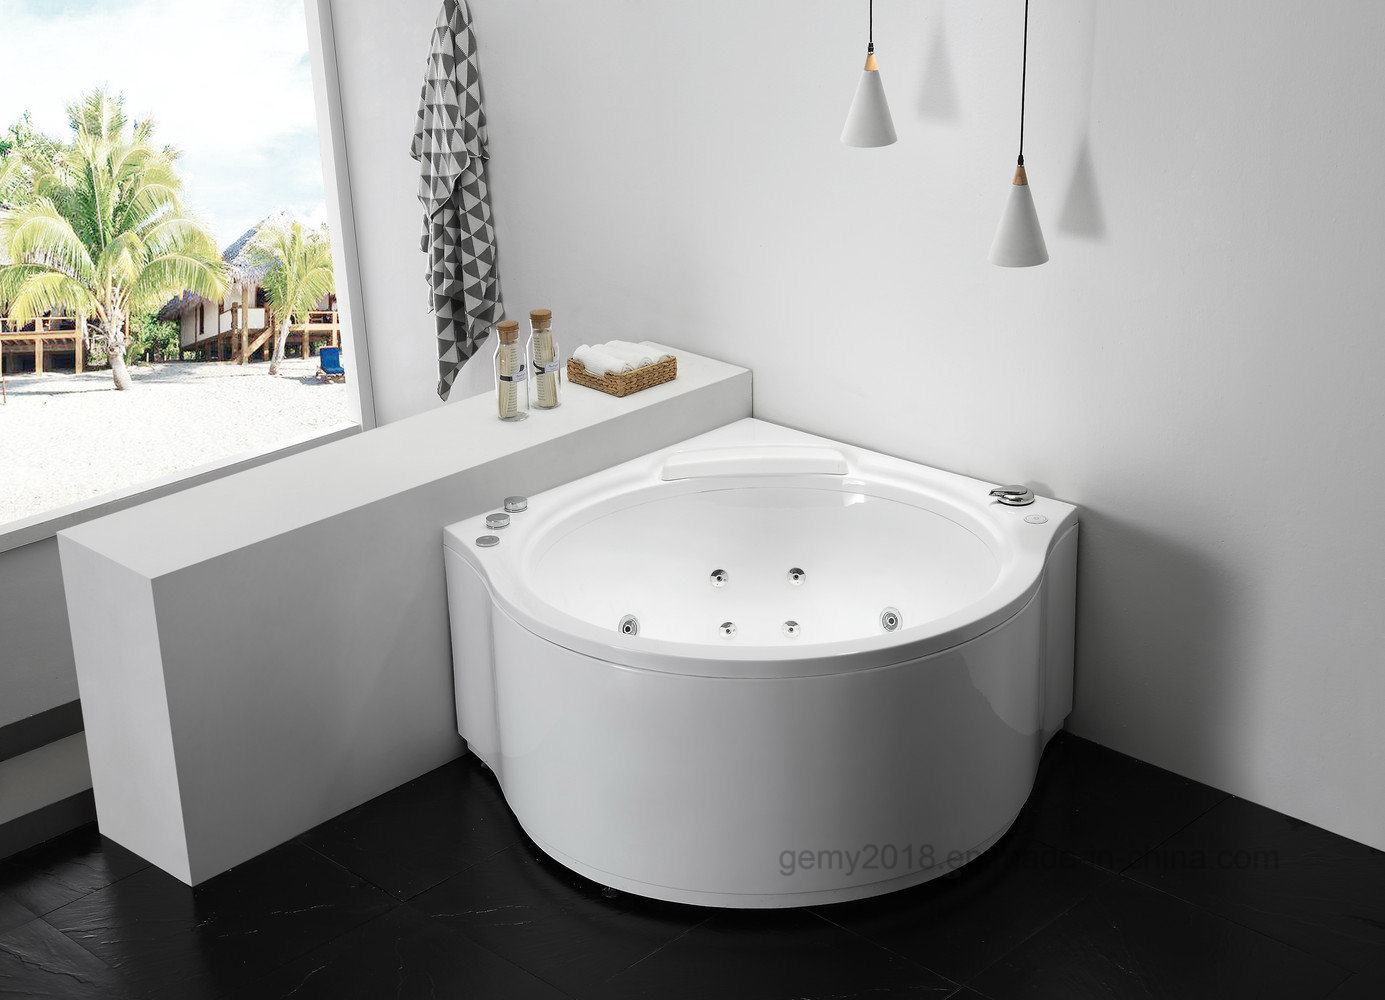 China Bath Bathtub with Massage Jet Bath Tub - China Massage Bathtub ...